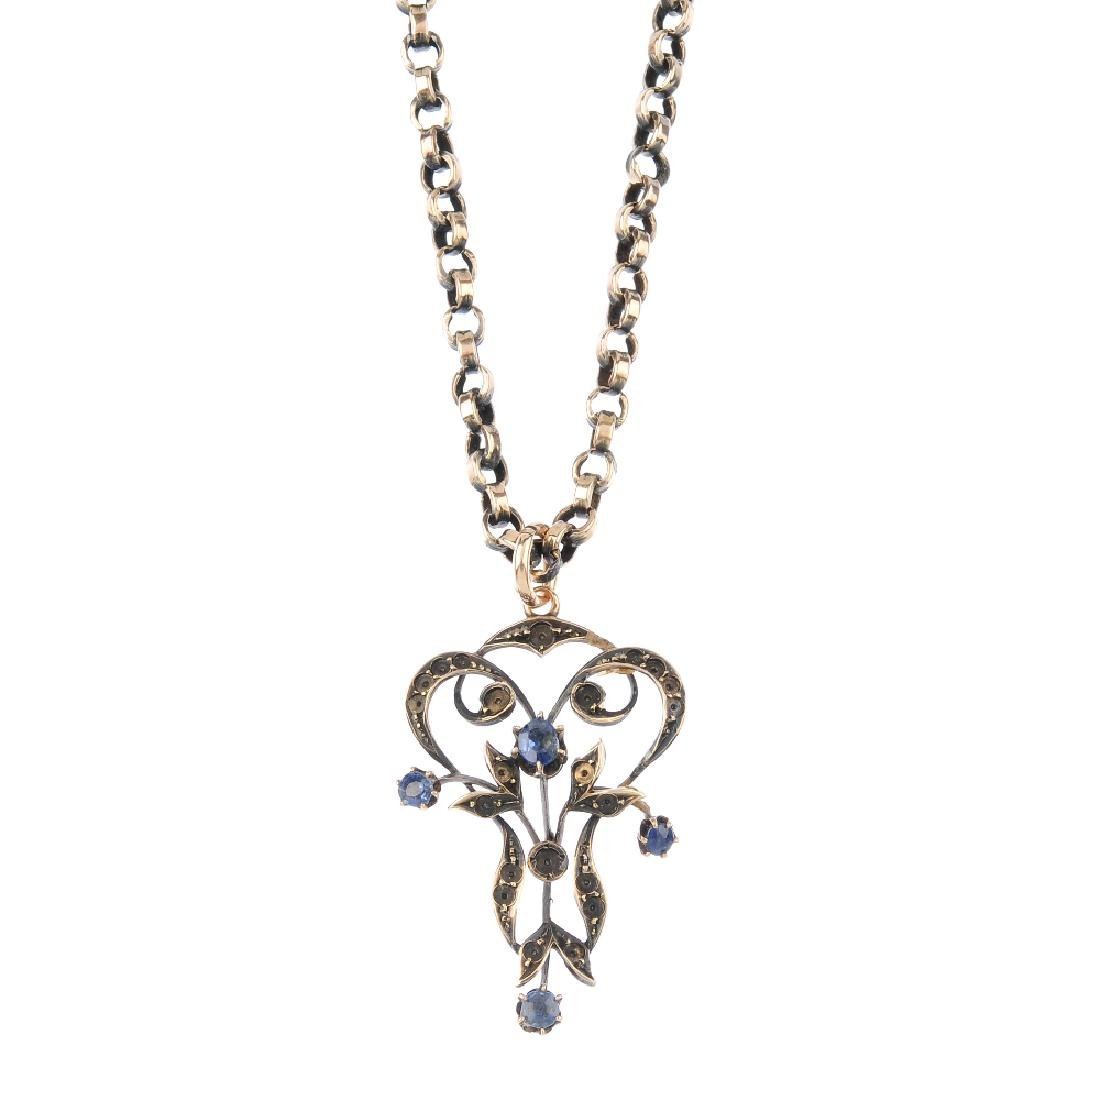 A sapphire pendant. Of openwork design, the central